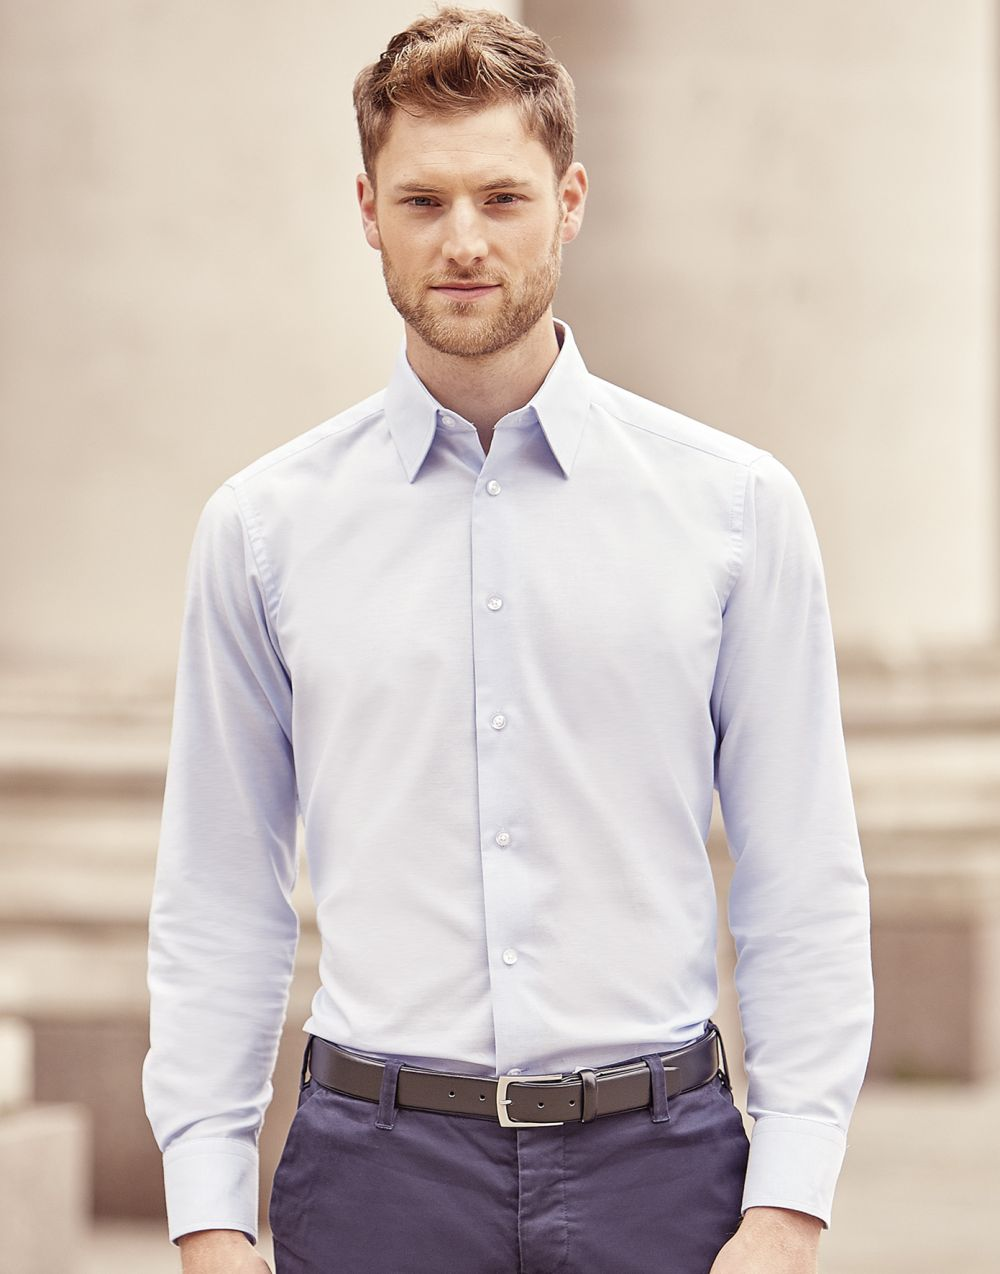 Camisas manga larga russell oxford de manga larga hombre vista 6